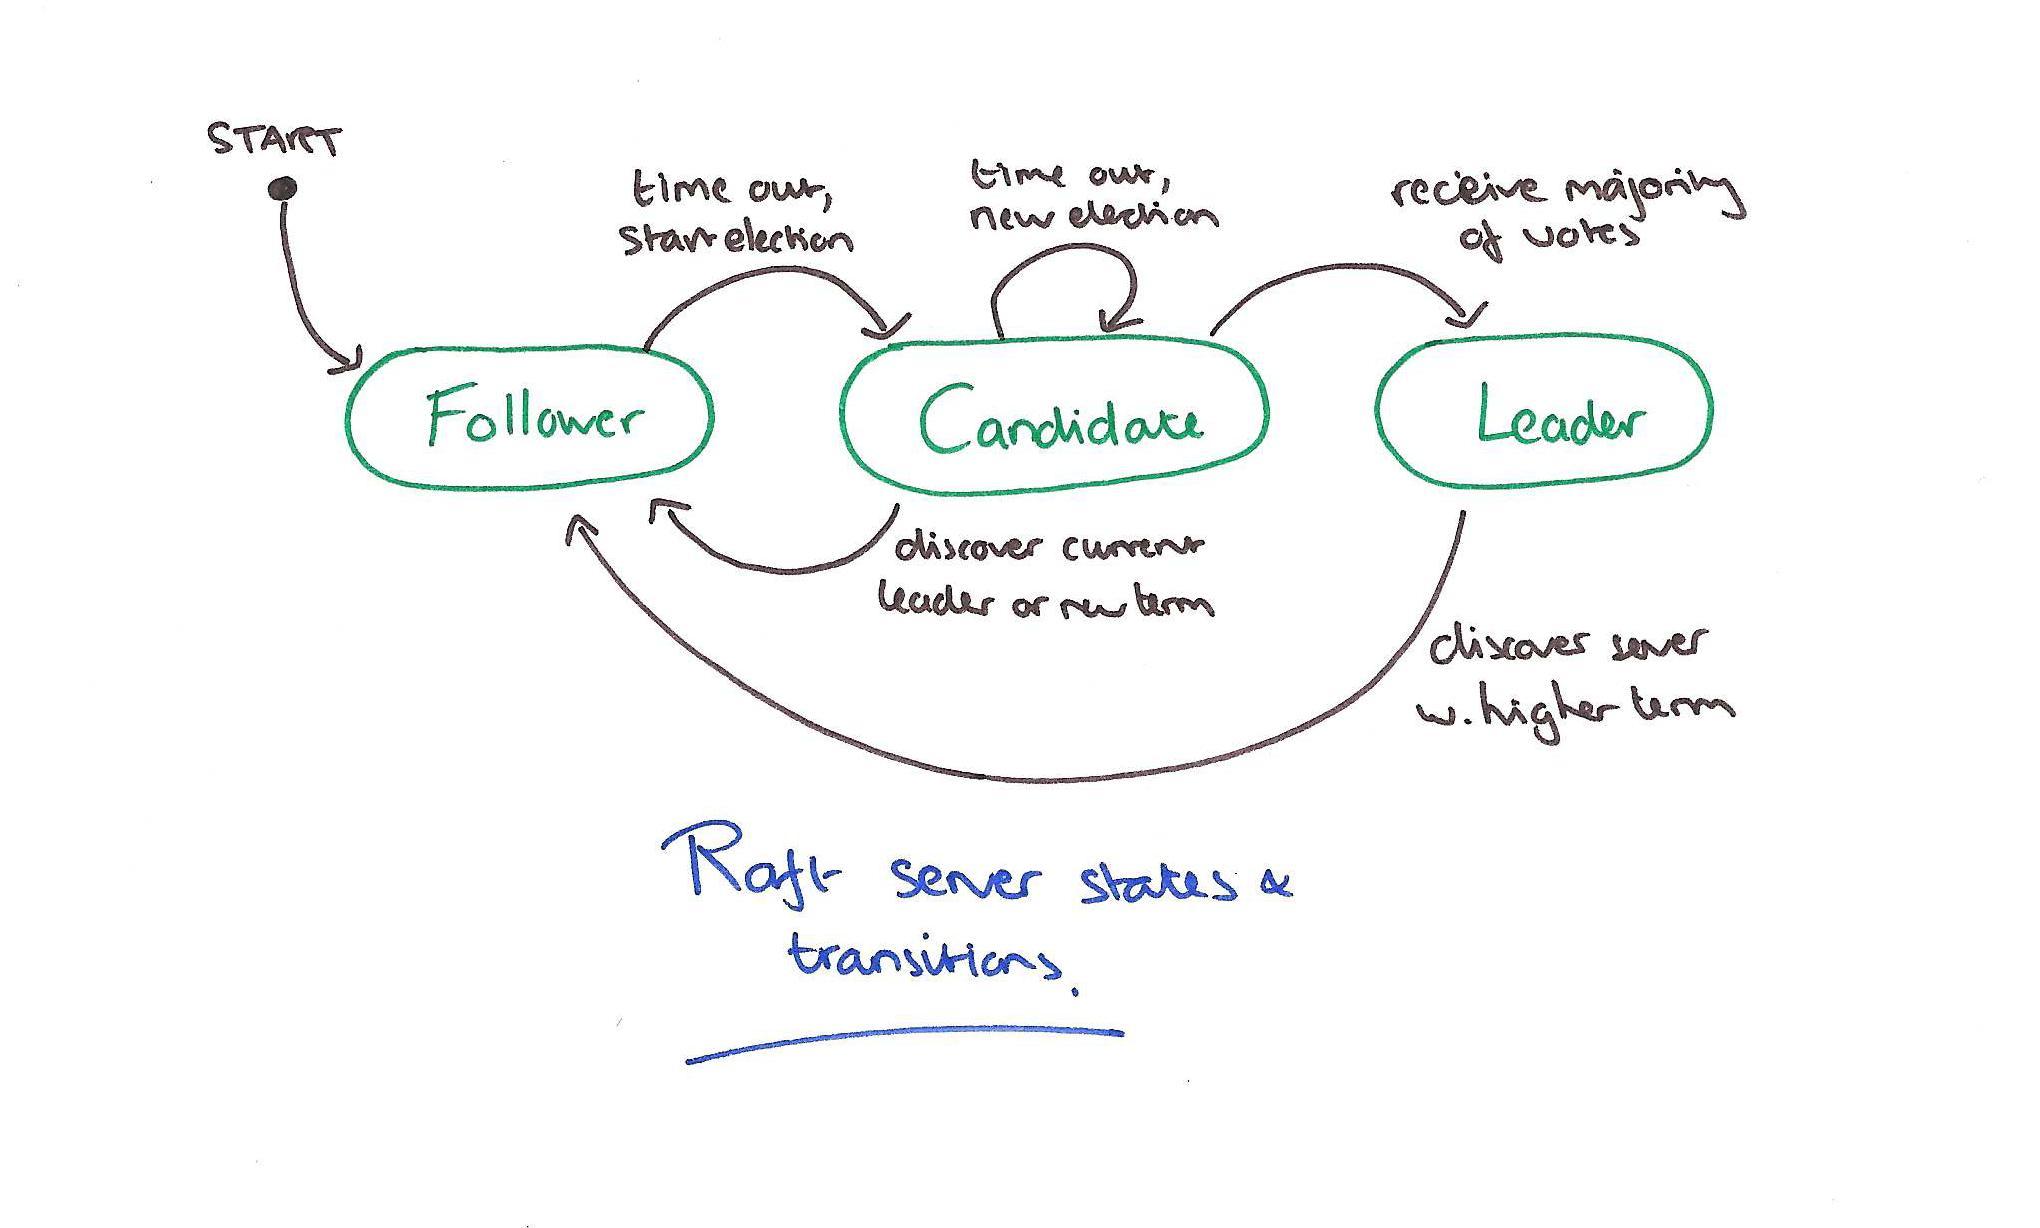 Status transition